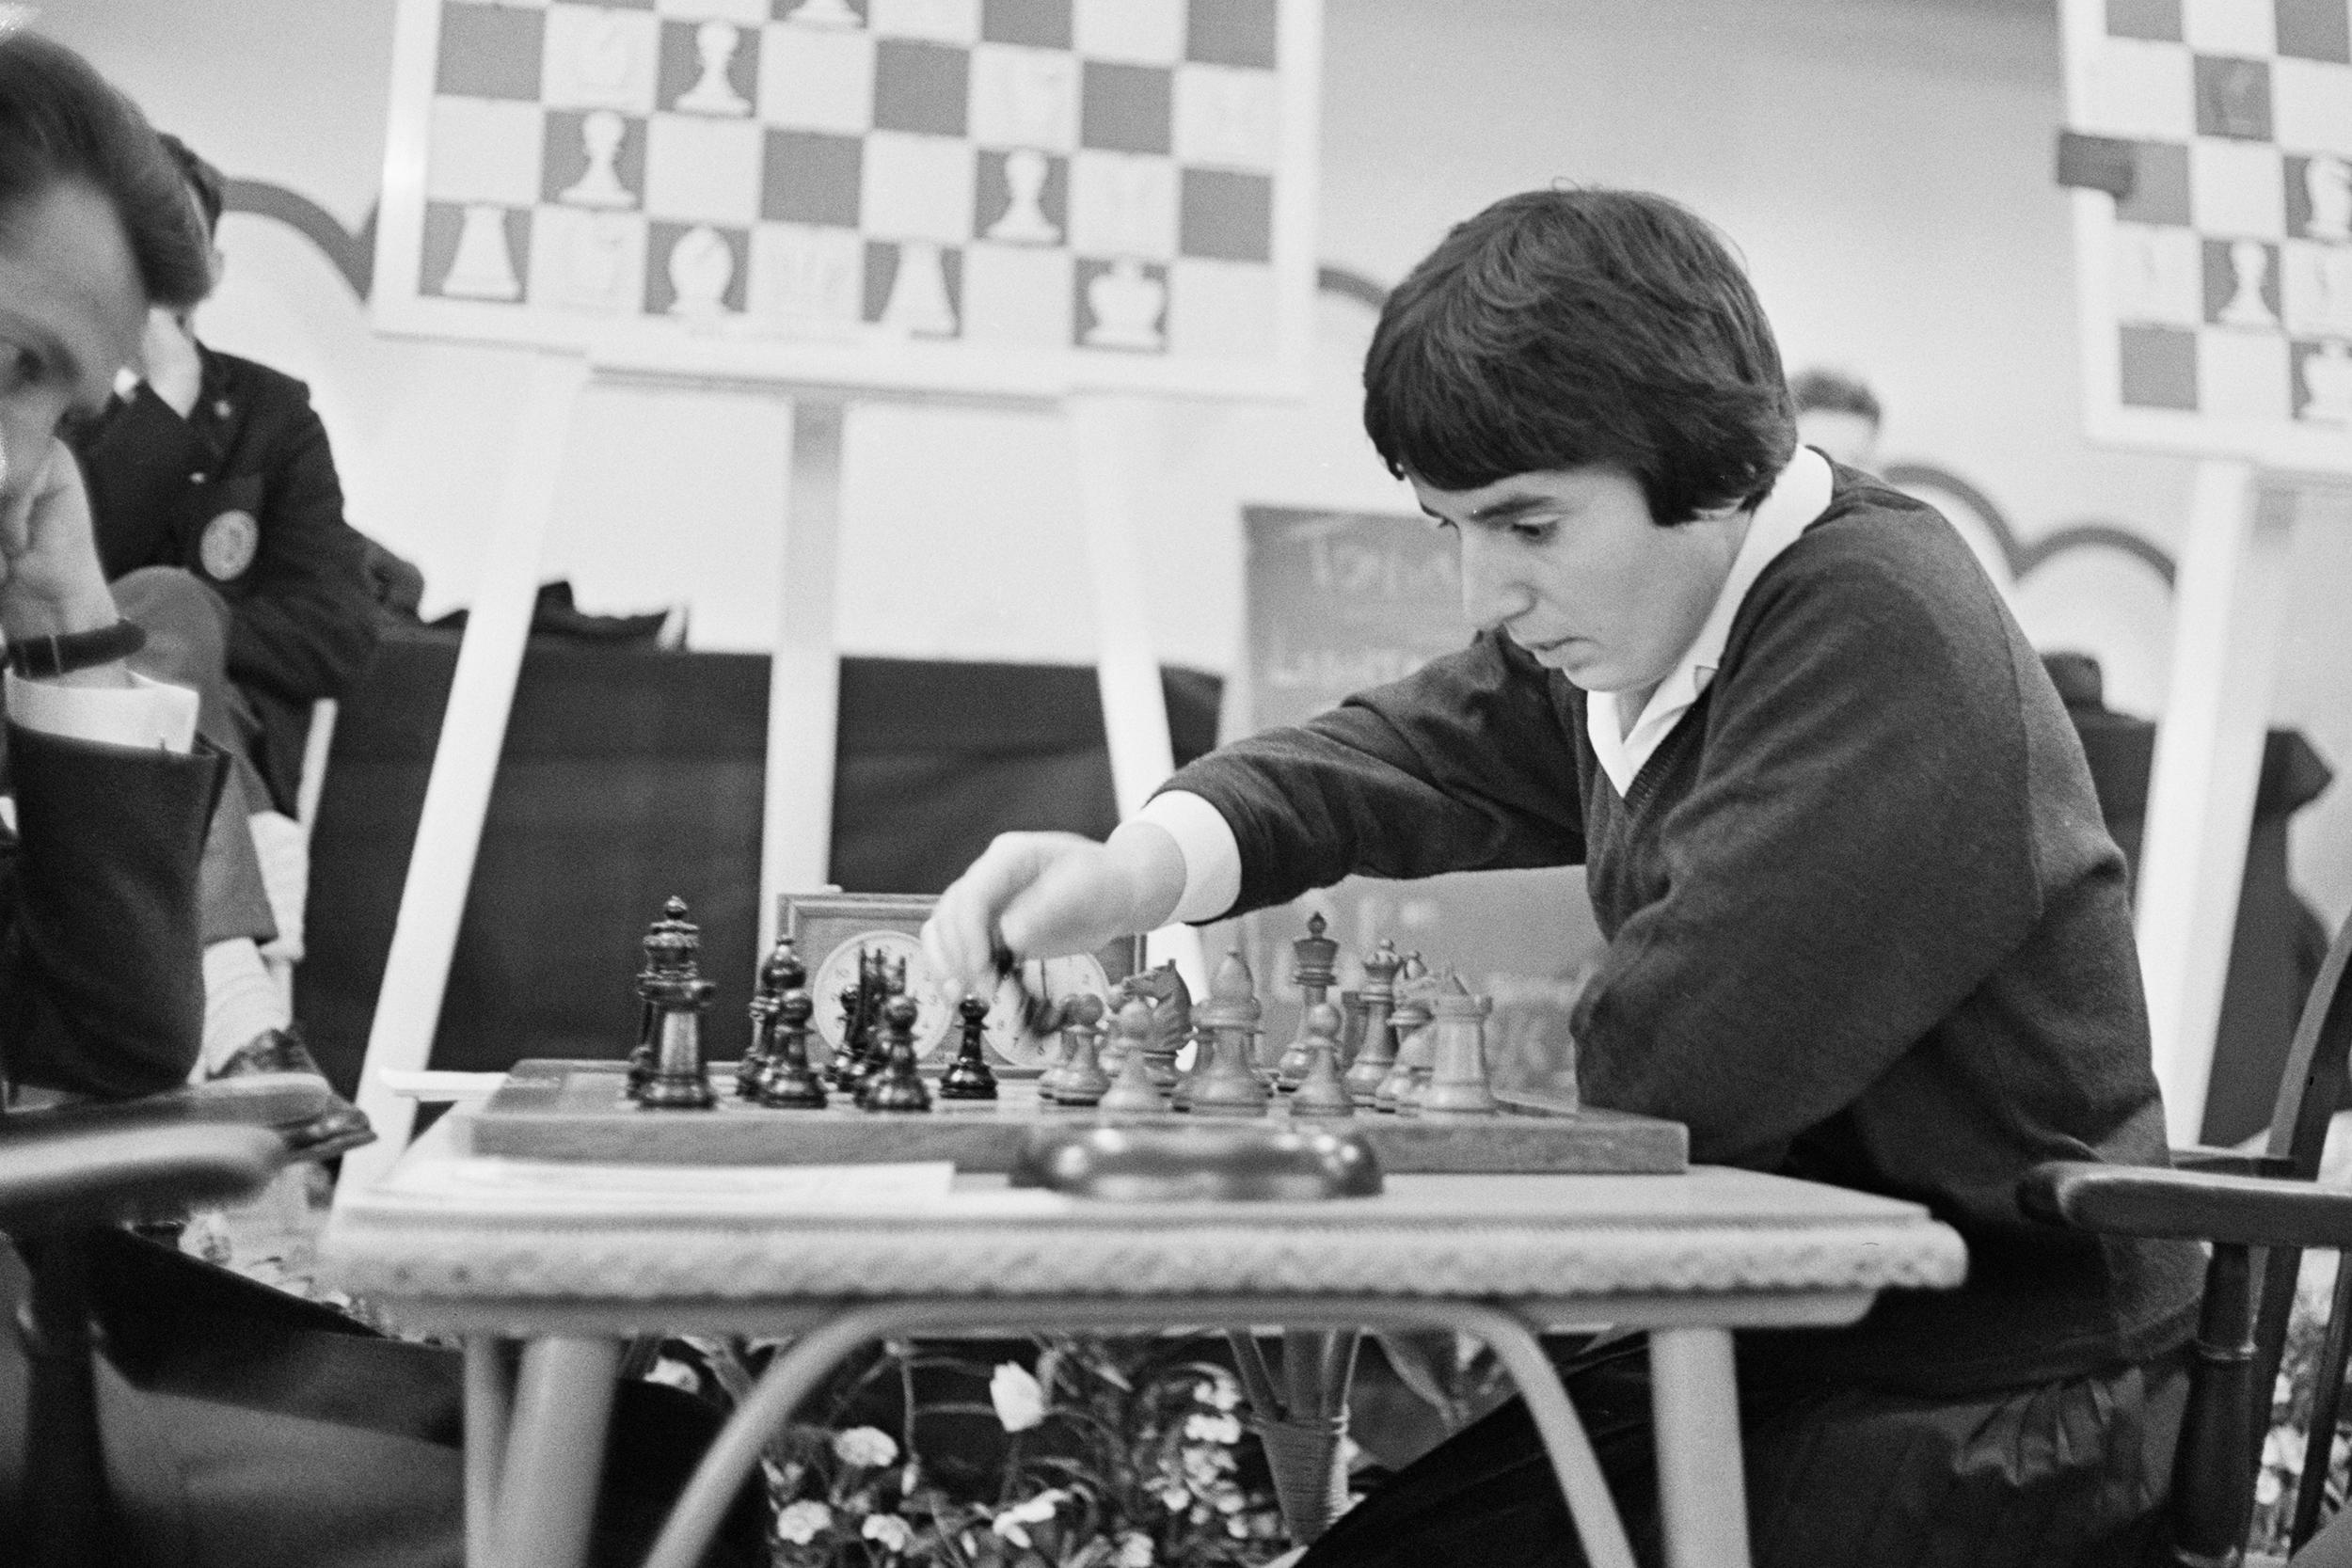 Former Soviet chess master seeks $5 million over 'sexist' line in 'Queen's Gambit'